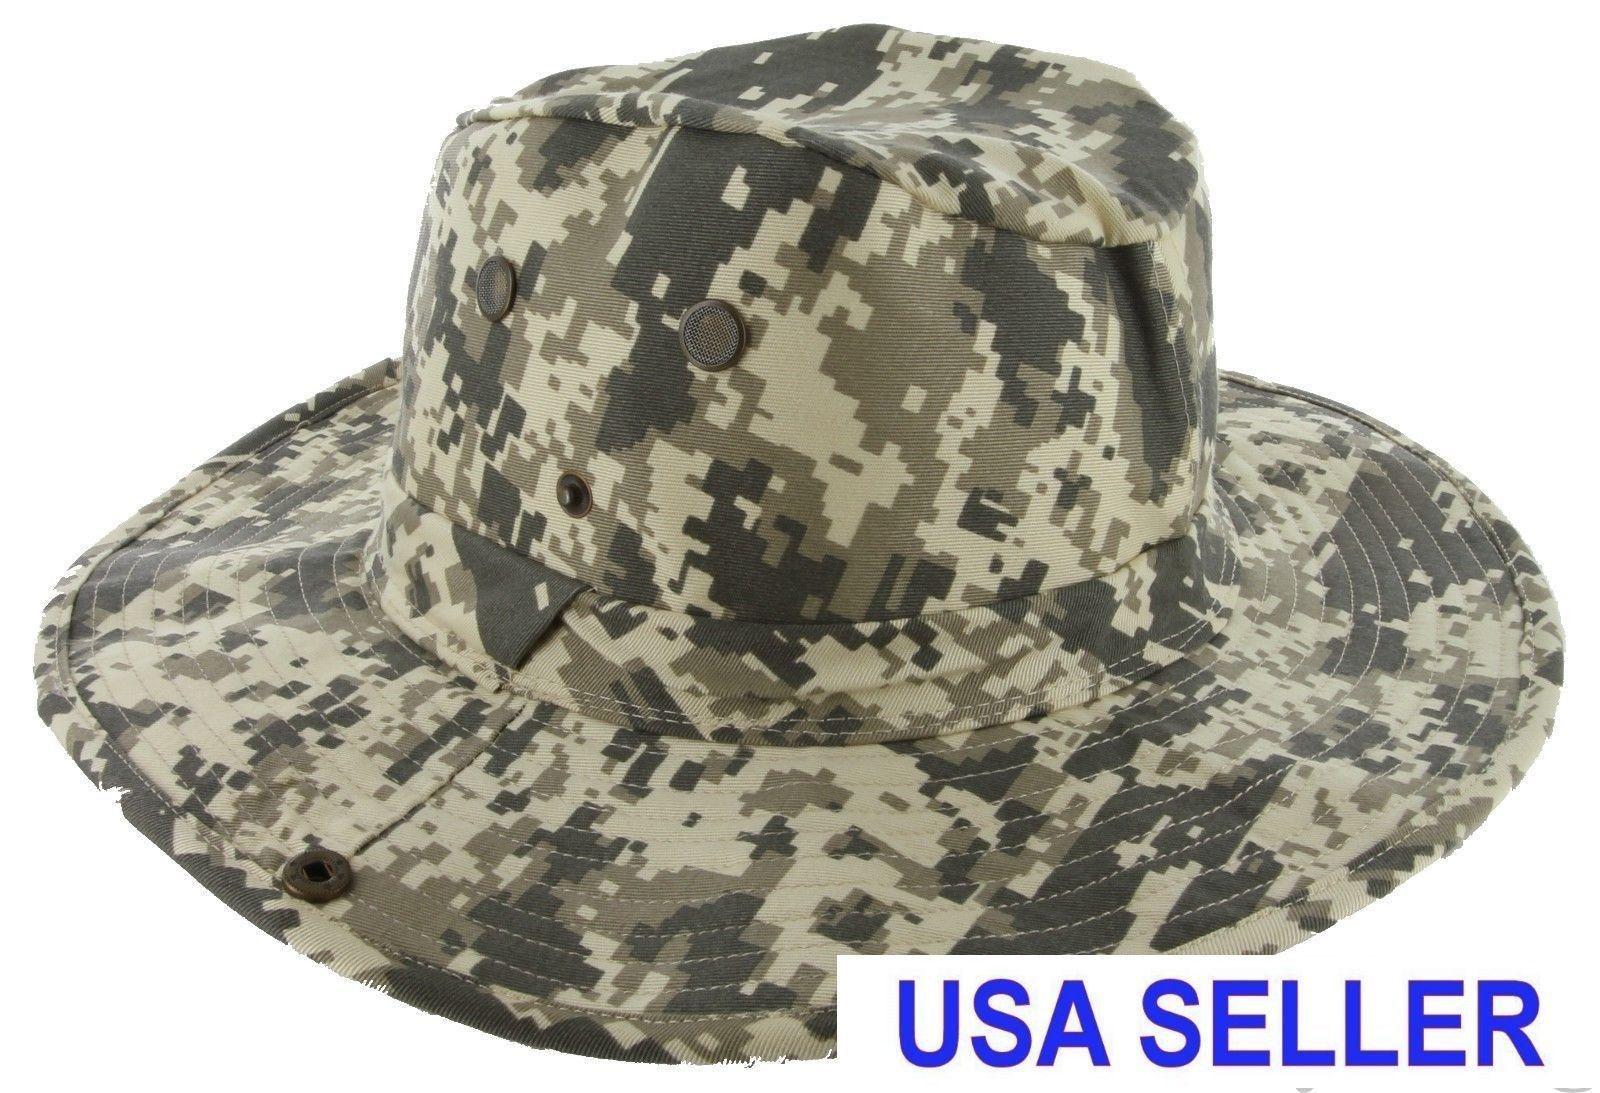 Camo Boonie Fishing Hiking Boating Army Military Camo Bucket Outdoor Hat Sun Cap Mesh